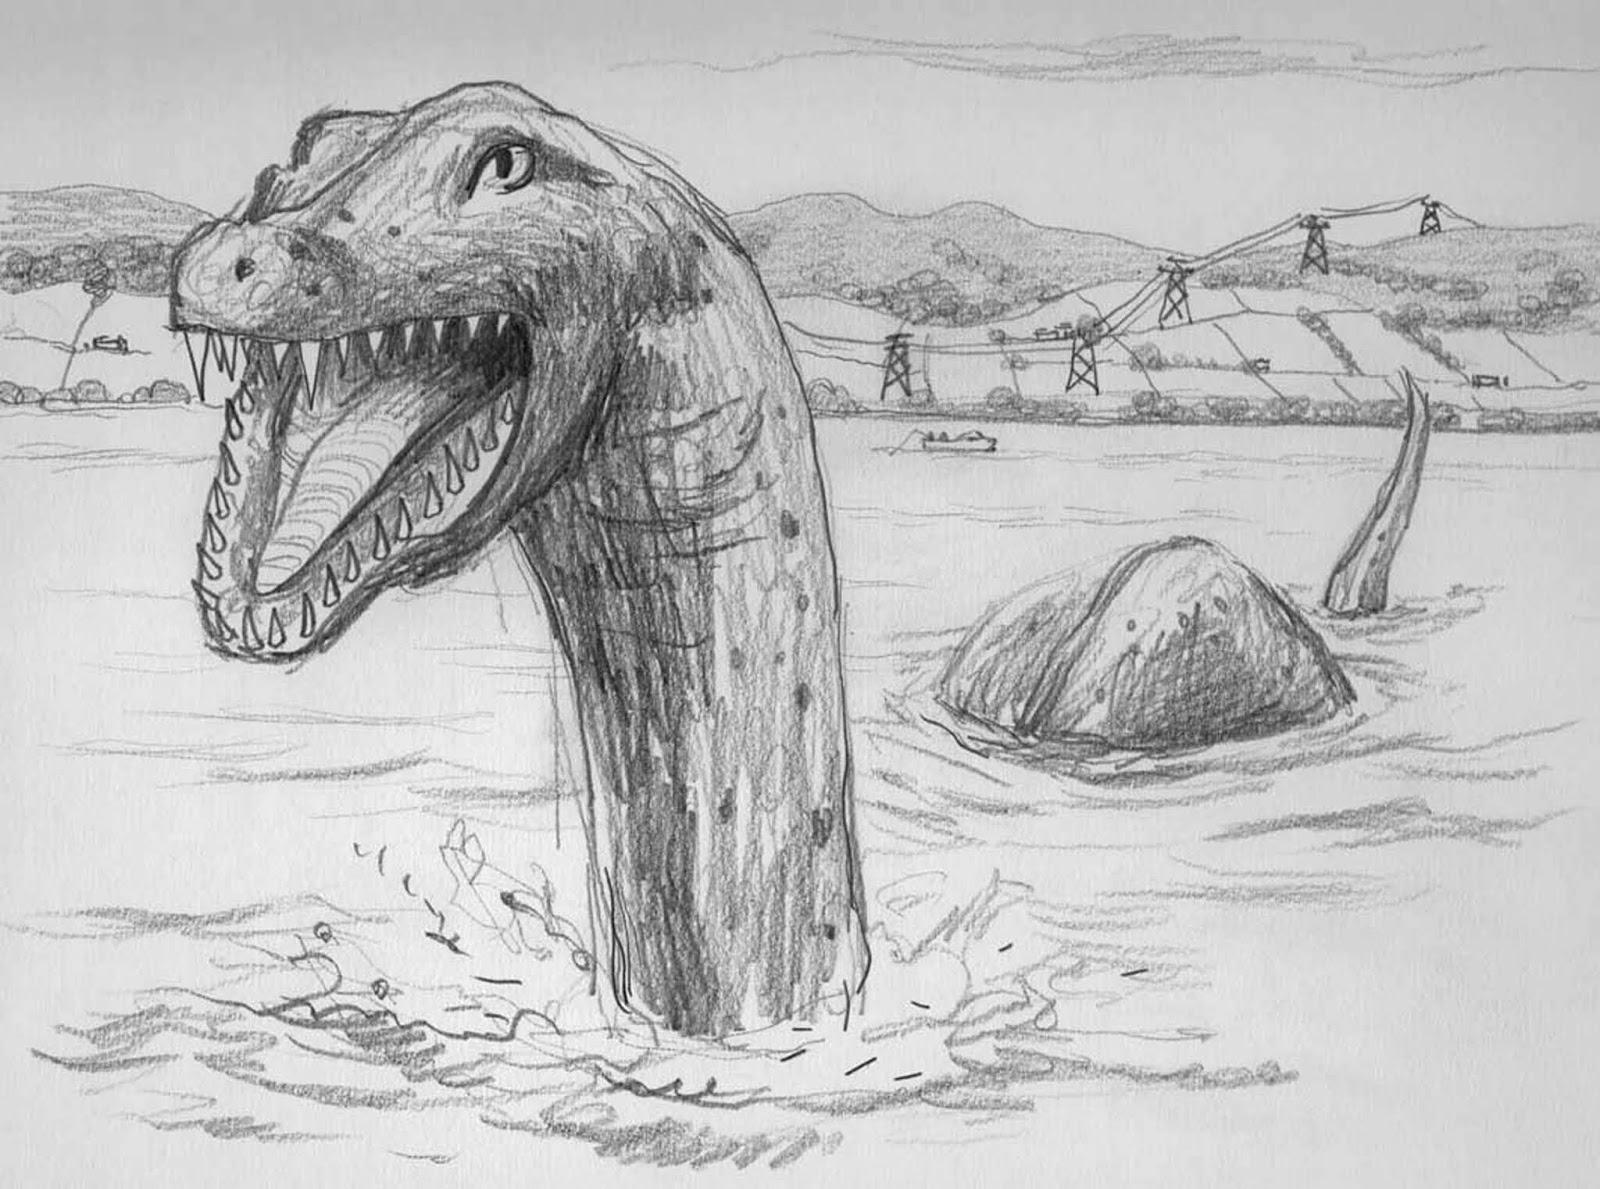 Loch Ness Monster An Unsettling Incident From Loch Ness